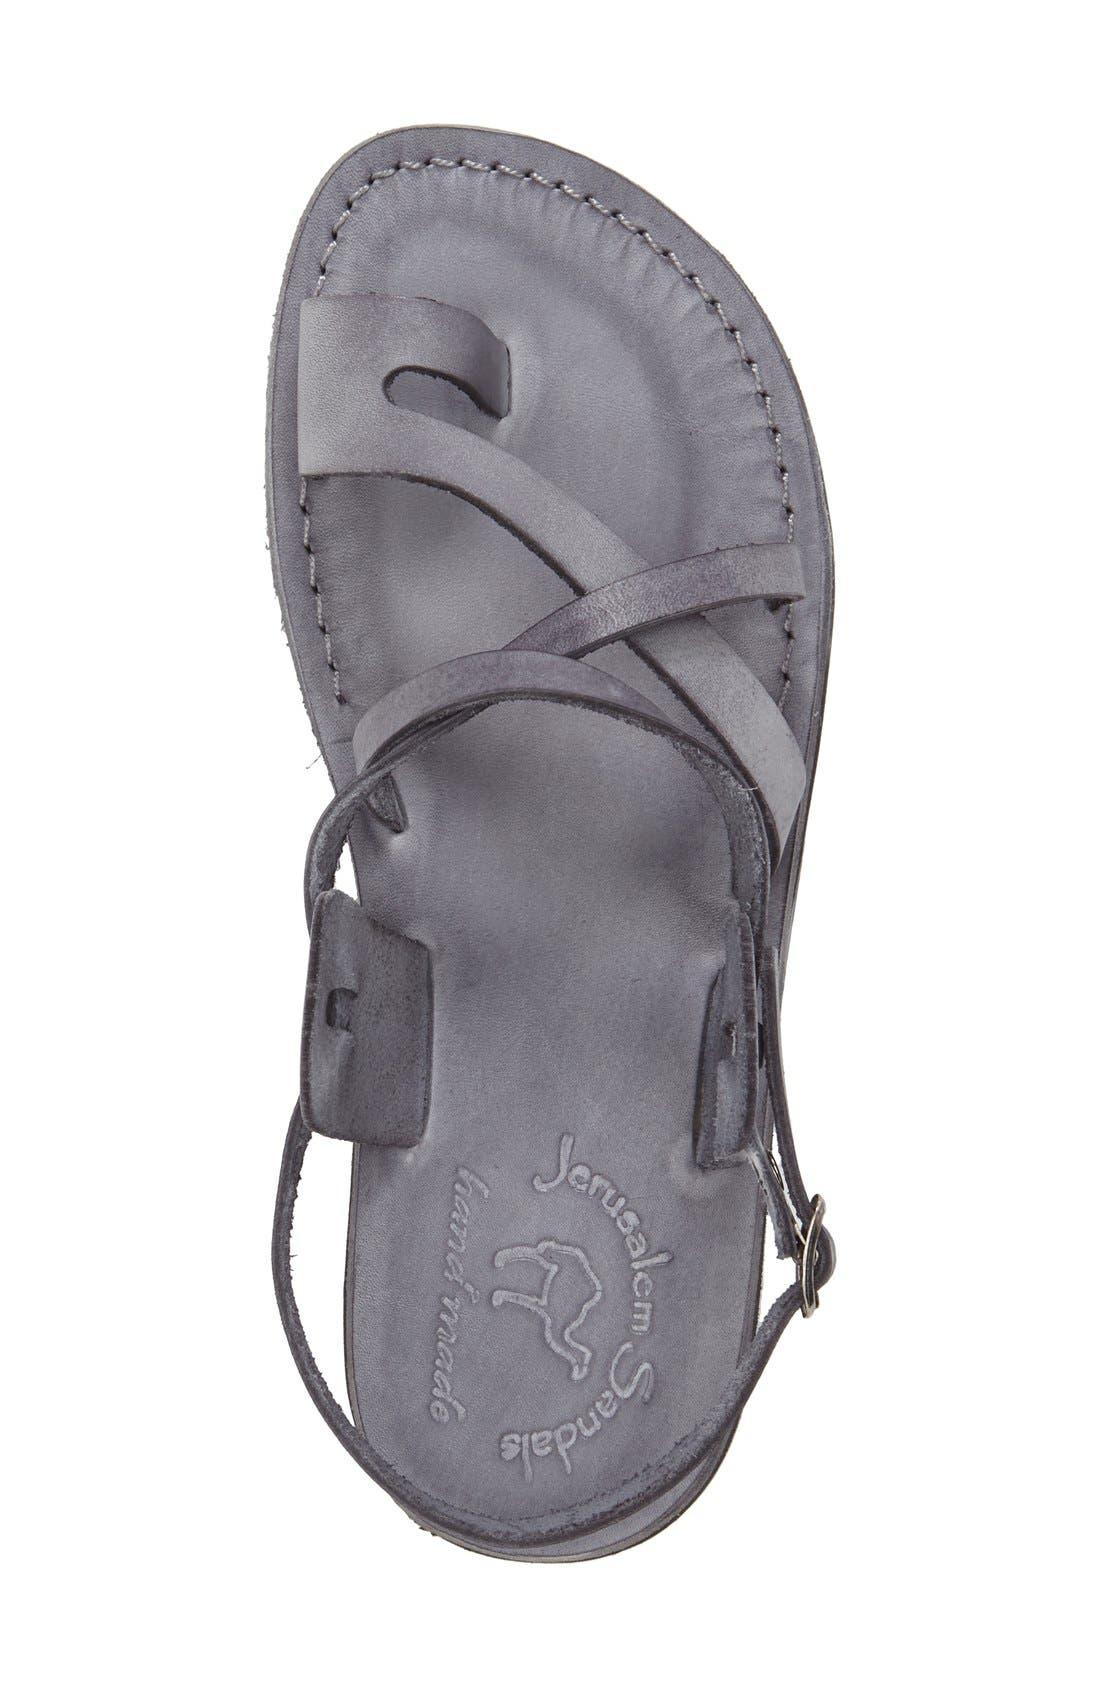 'The Good Shepherd' Leather Sandal,                             Alternate thumbnail 3, color,                             GREY LEATHER